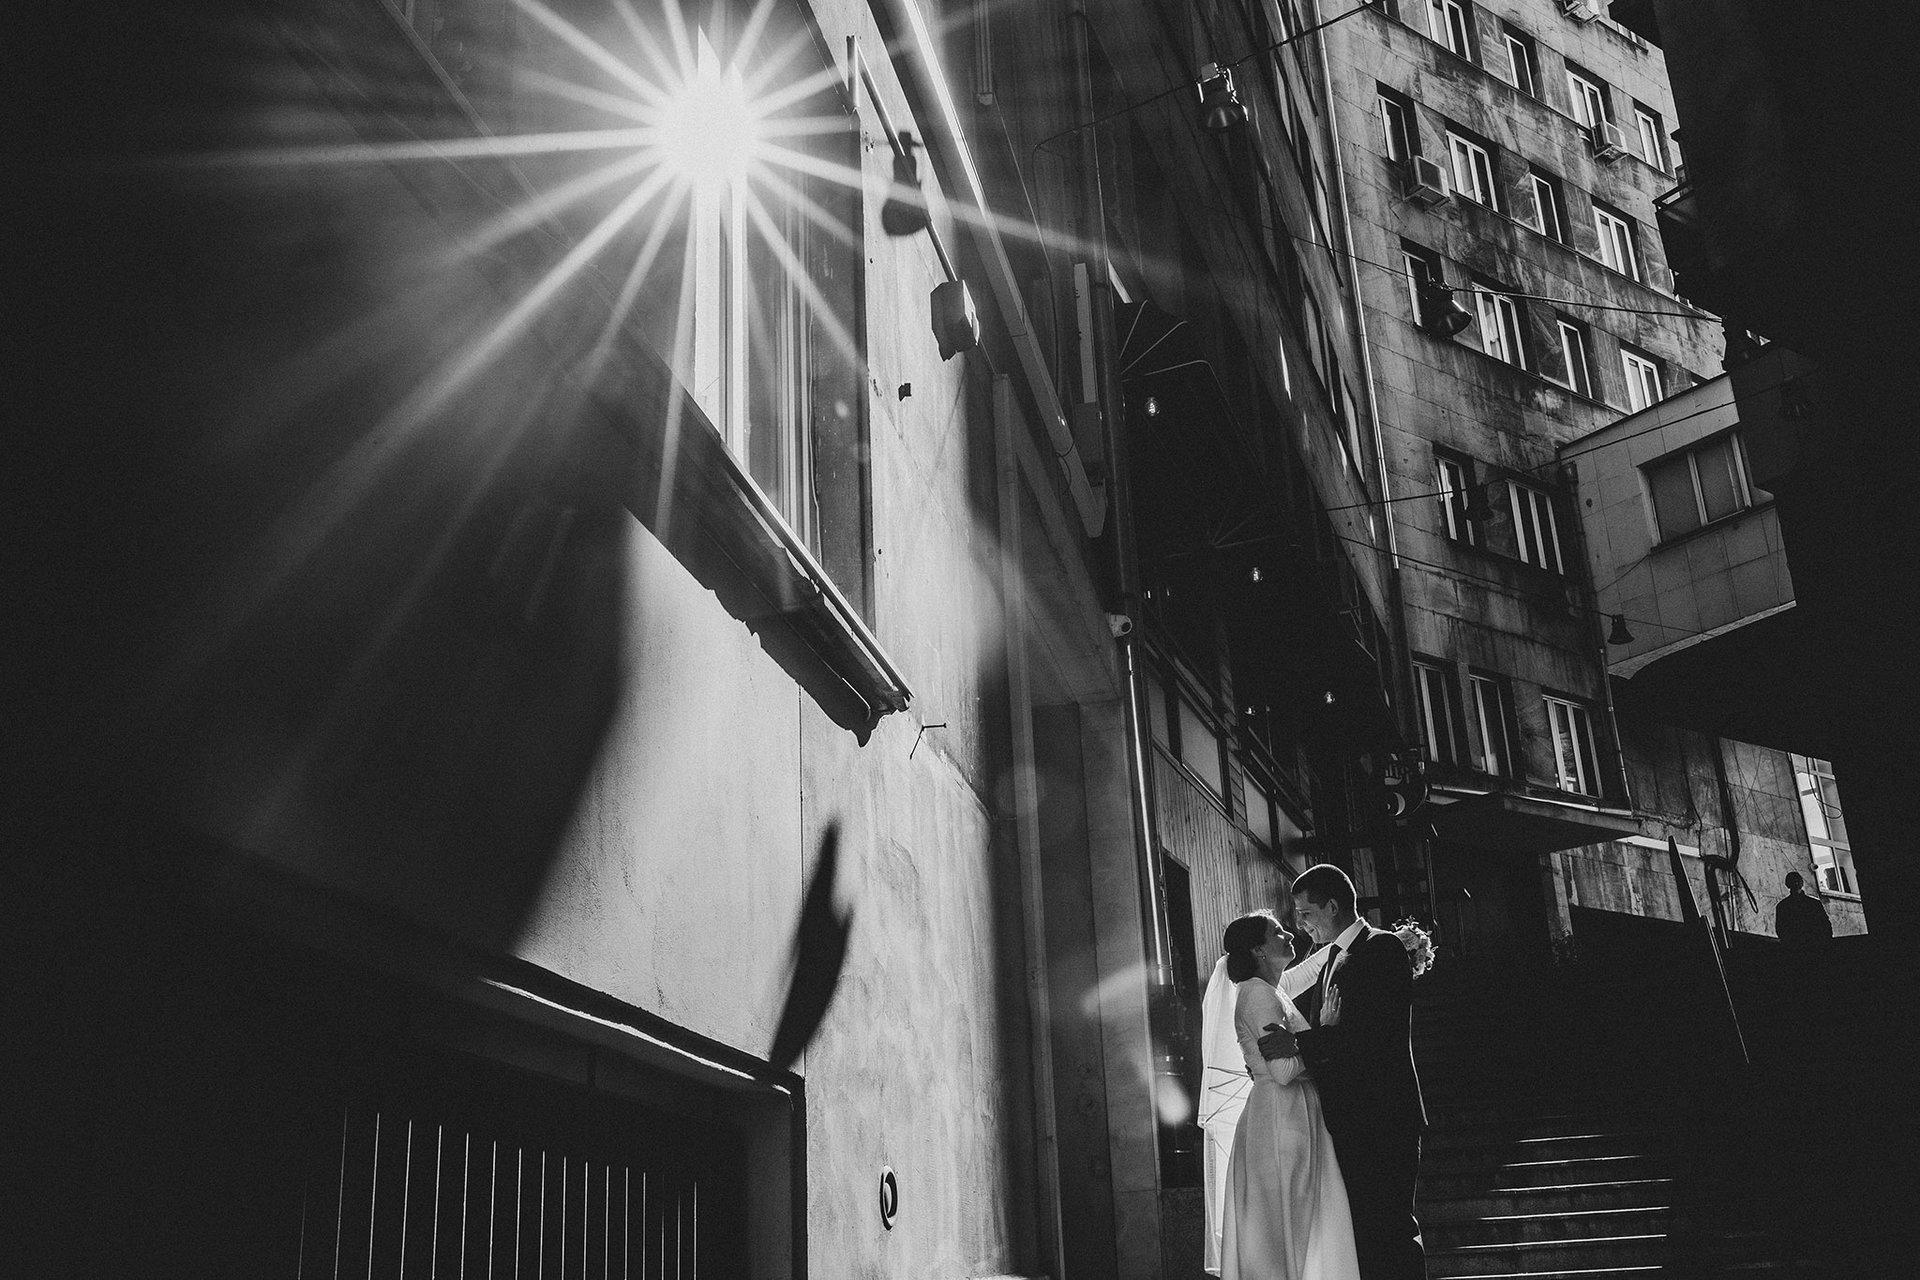 Photo in Wedding | Author tisho86 | PHOTO FORUM